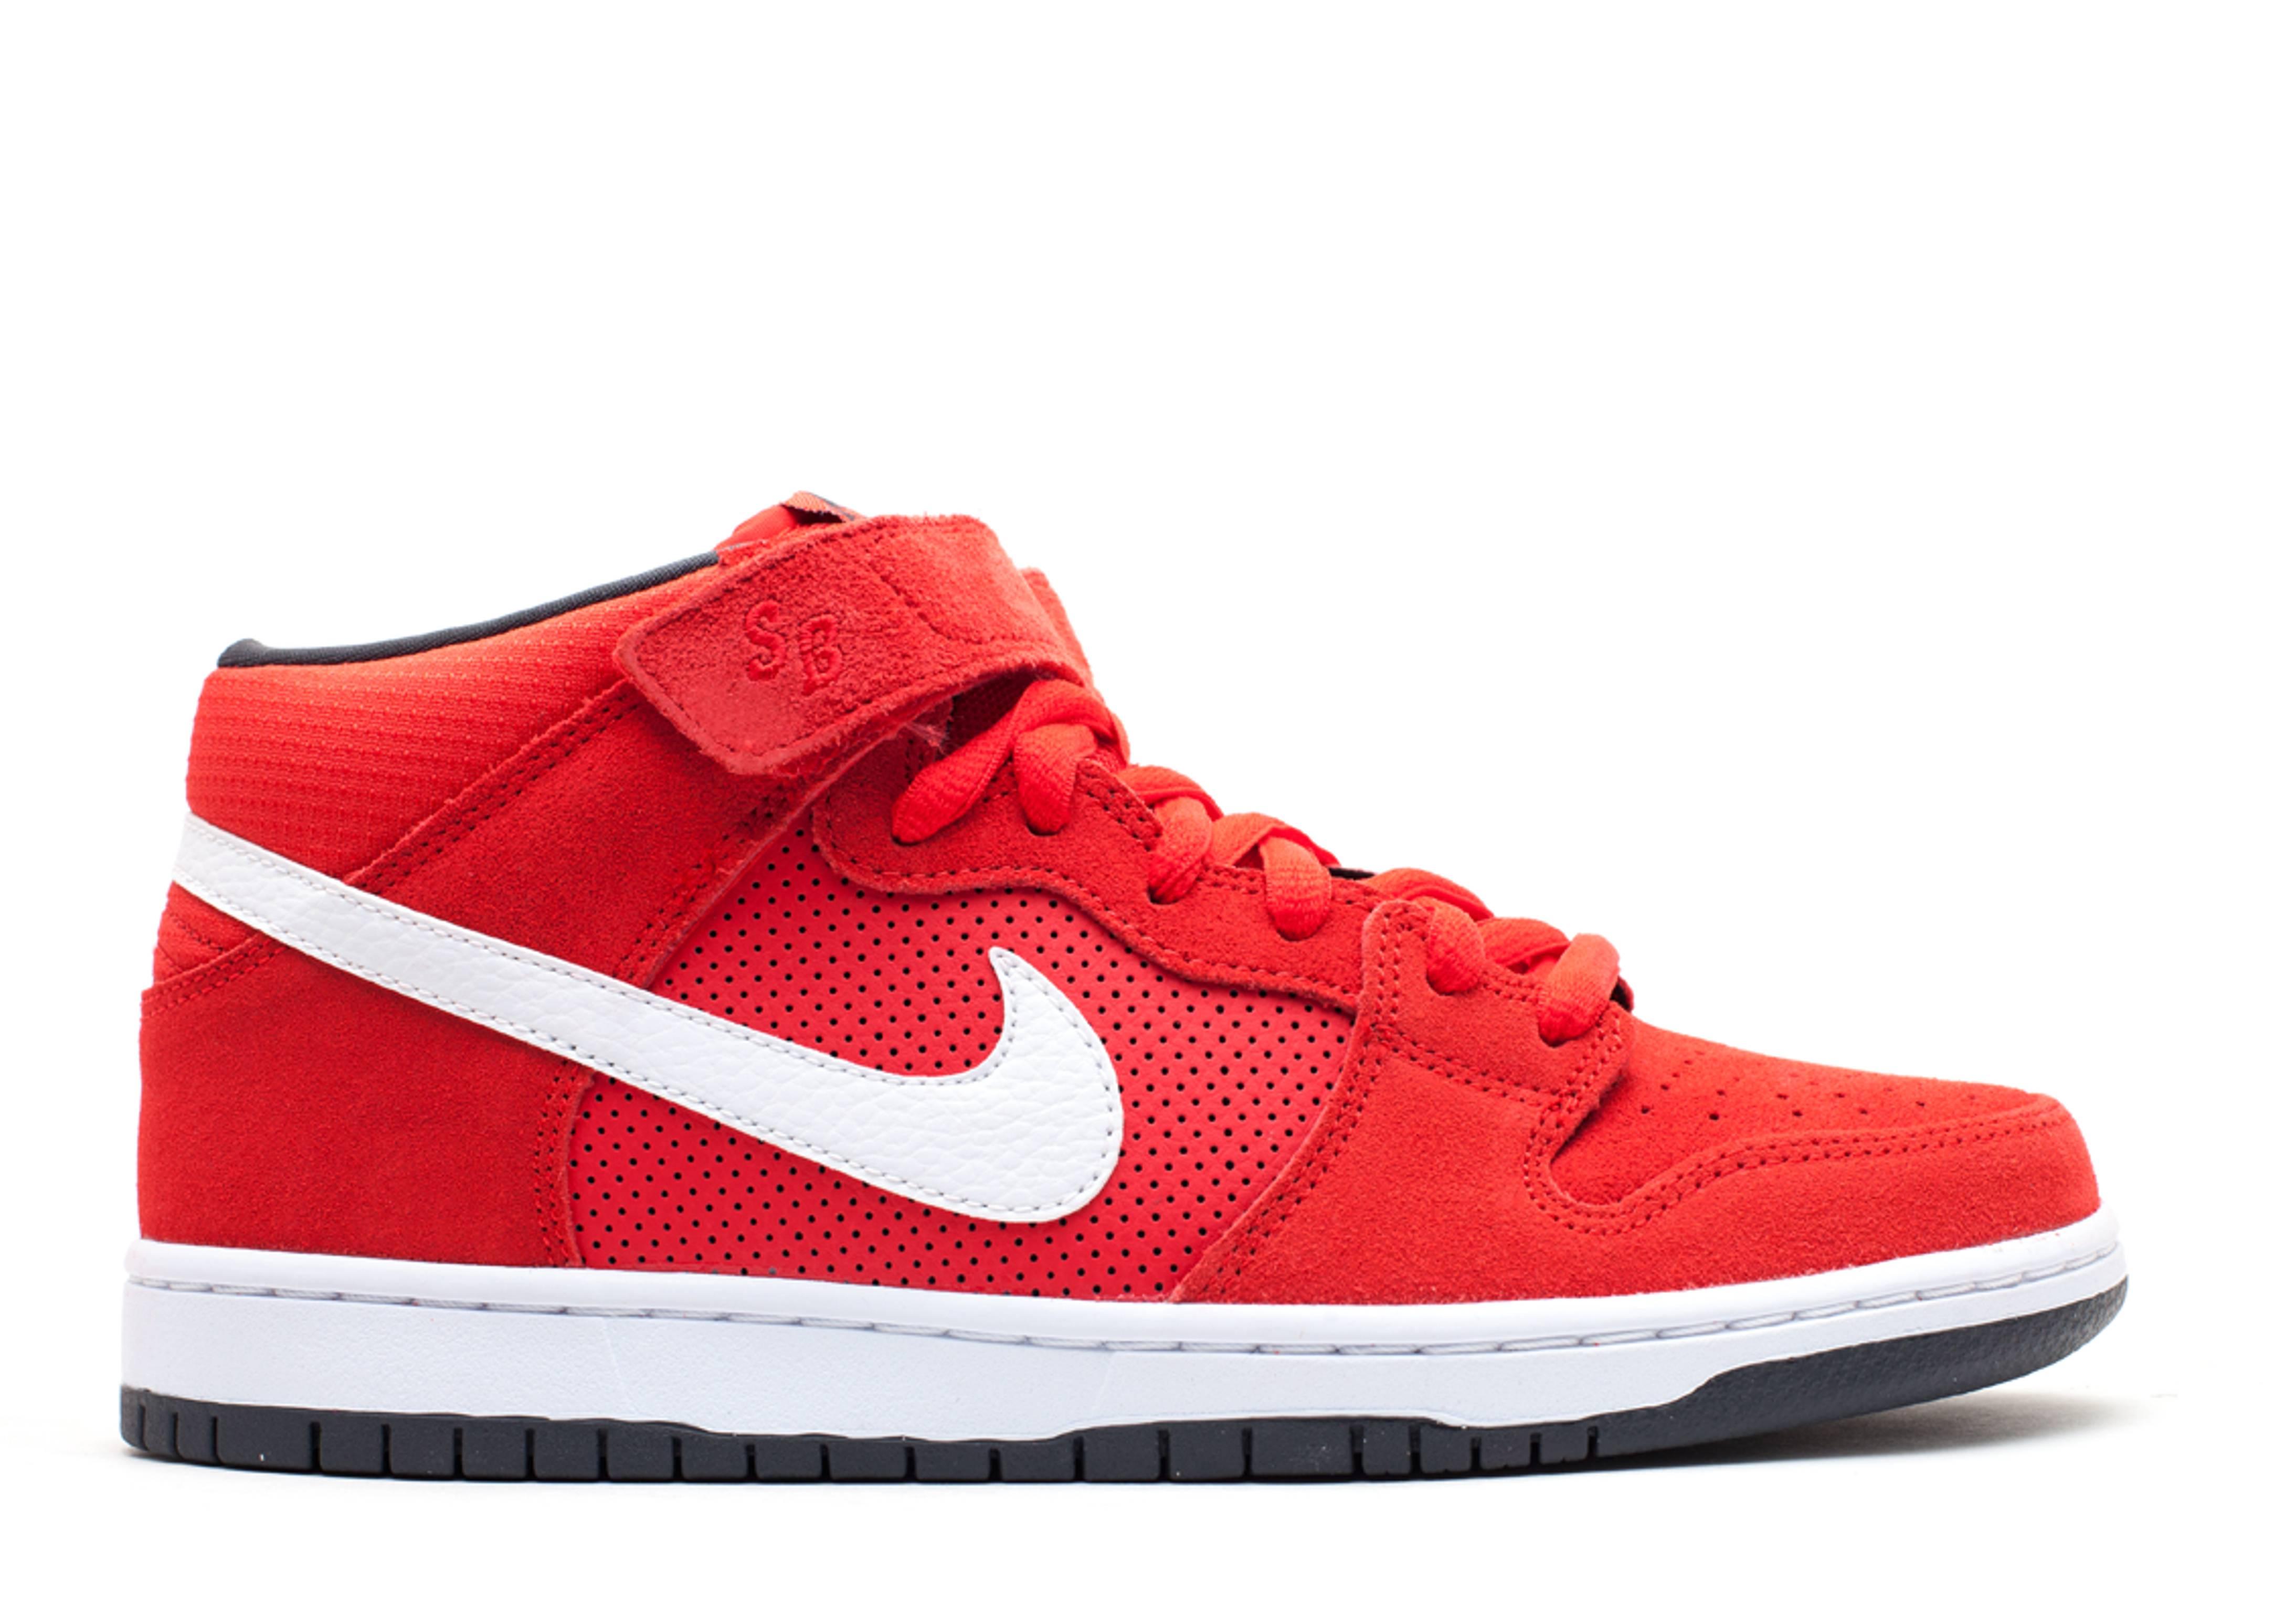 Dunk Mid Pro Sb - Nike - 314383 610 - hyper red/white-anthracite ...